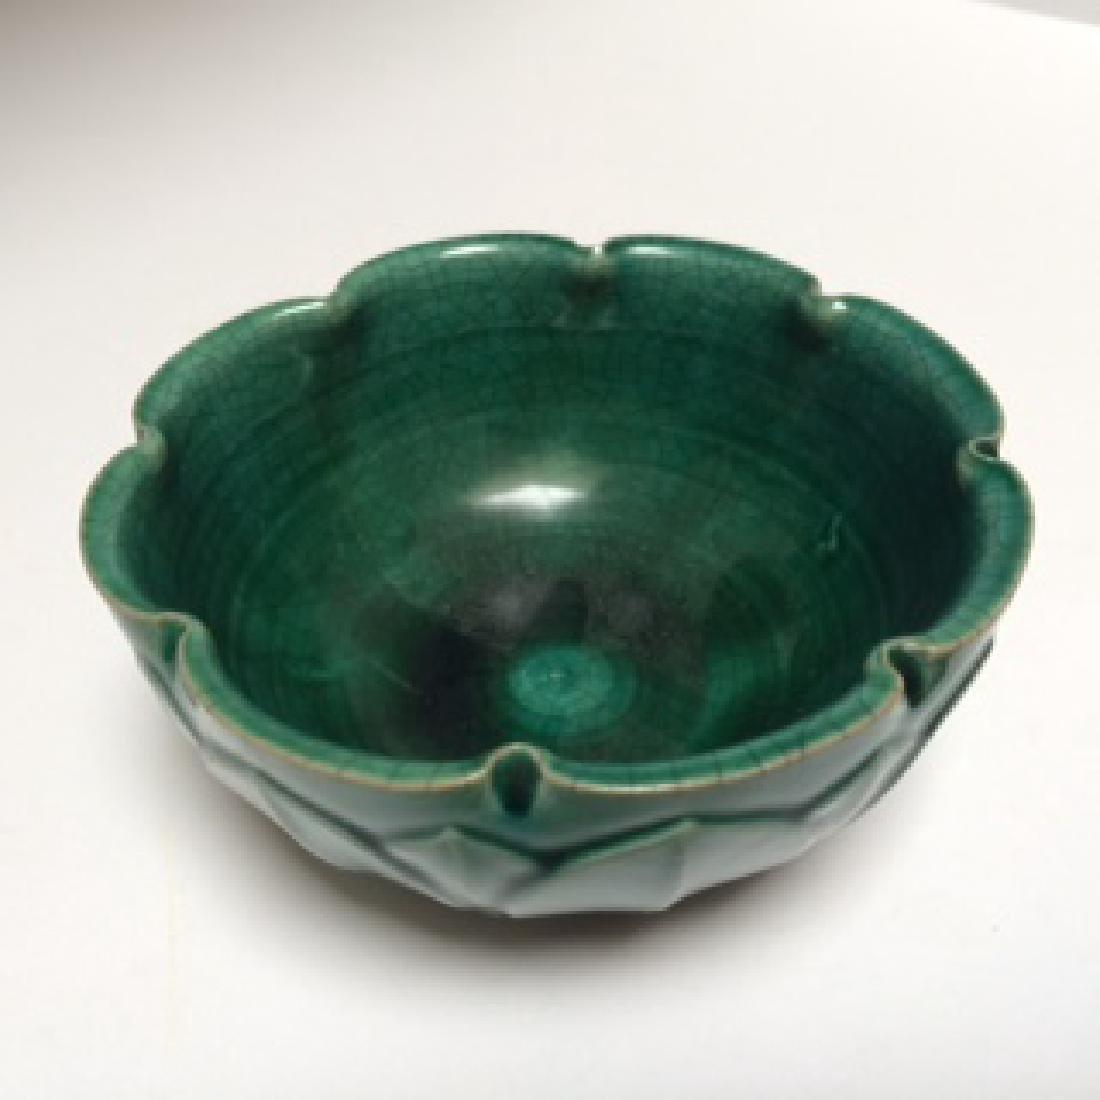 "Qing Dynasty Dark Green Porcelain Lotus Bowl 4.5""Dia"